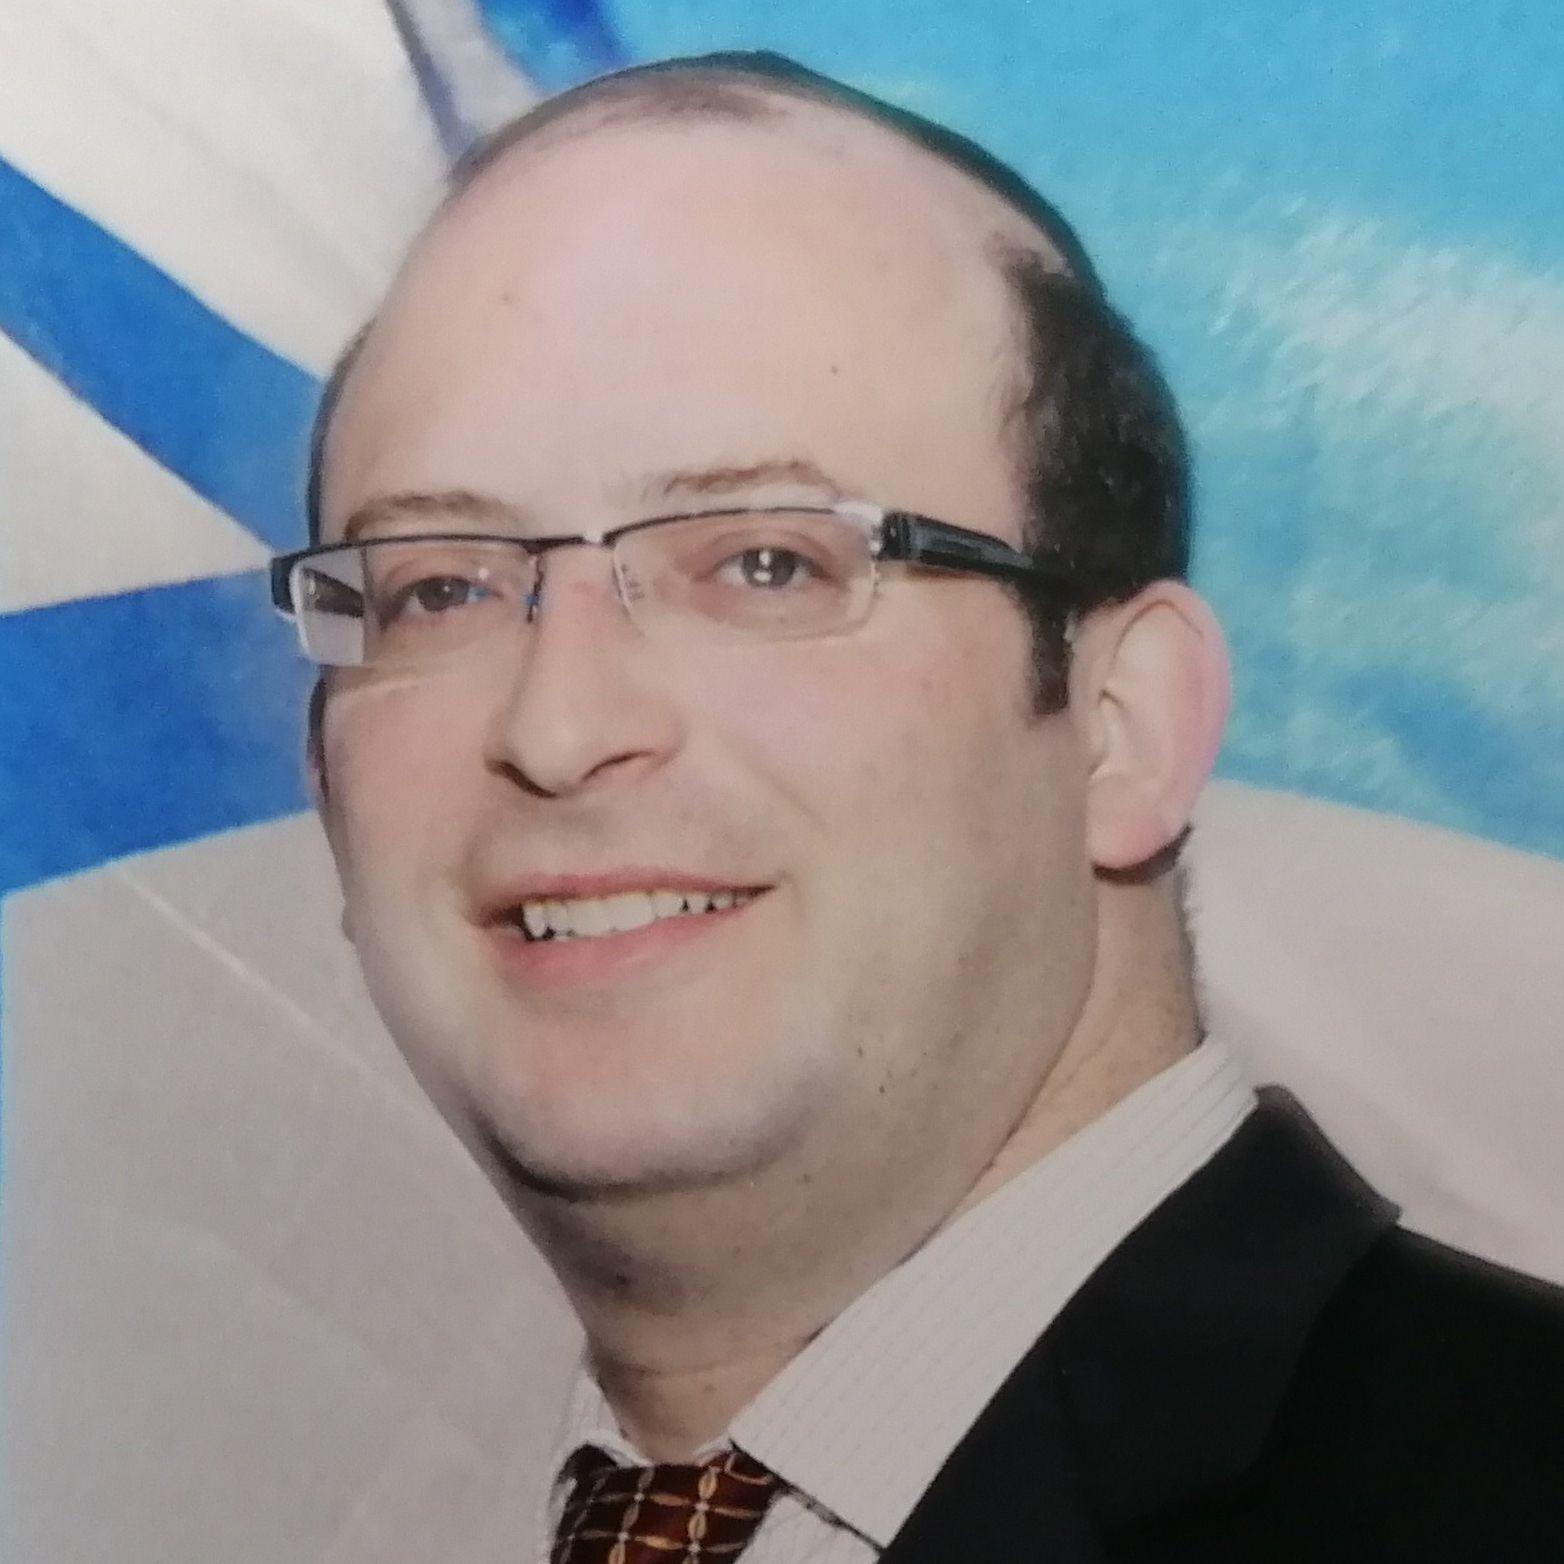 Gidon Katz, CEO of IMP International in Israel